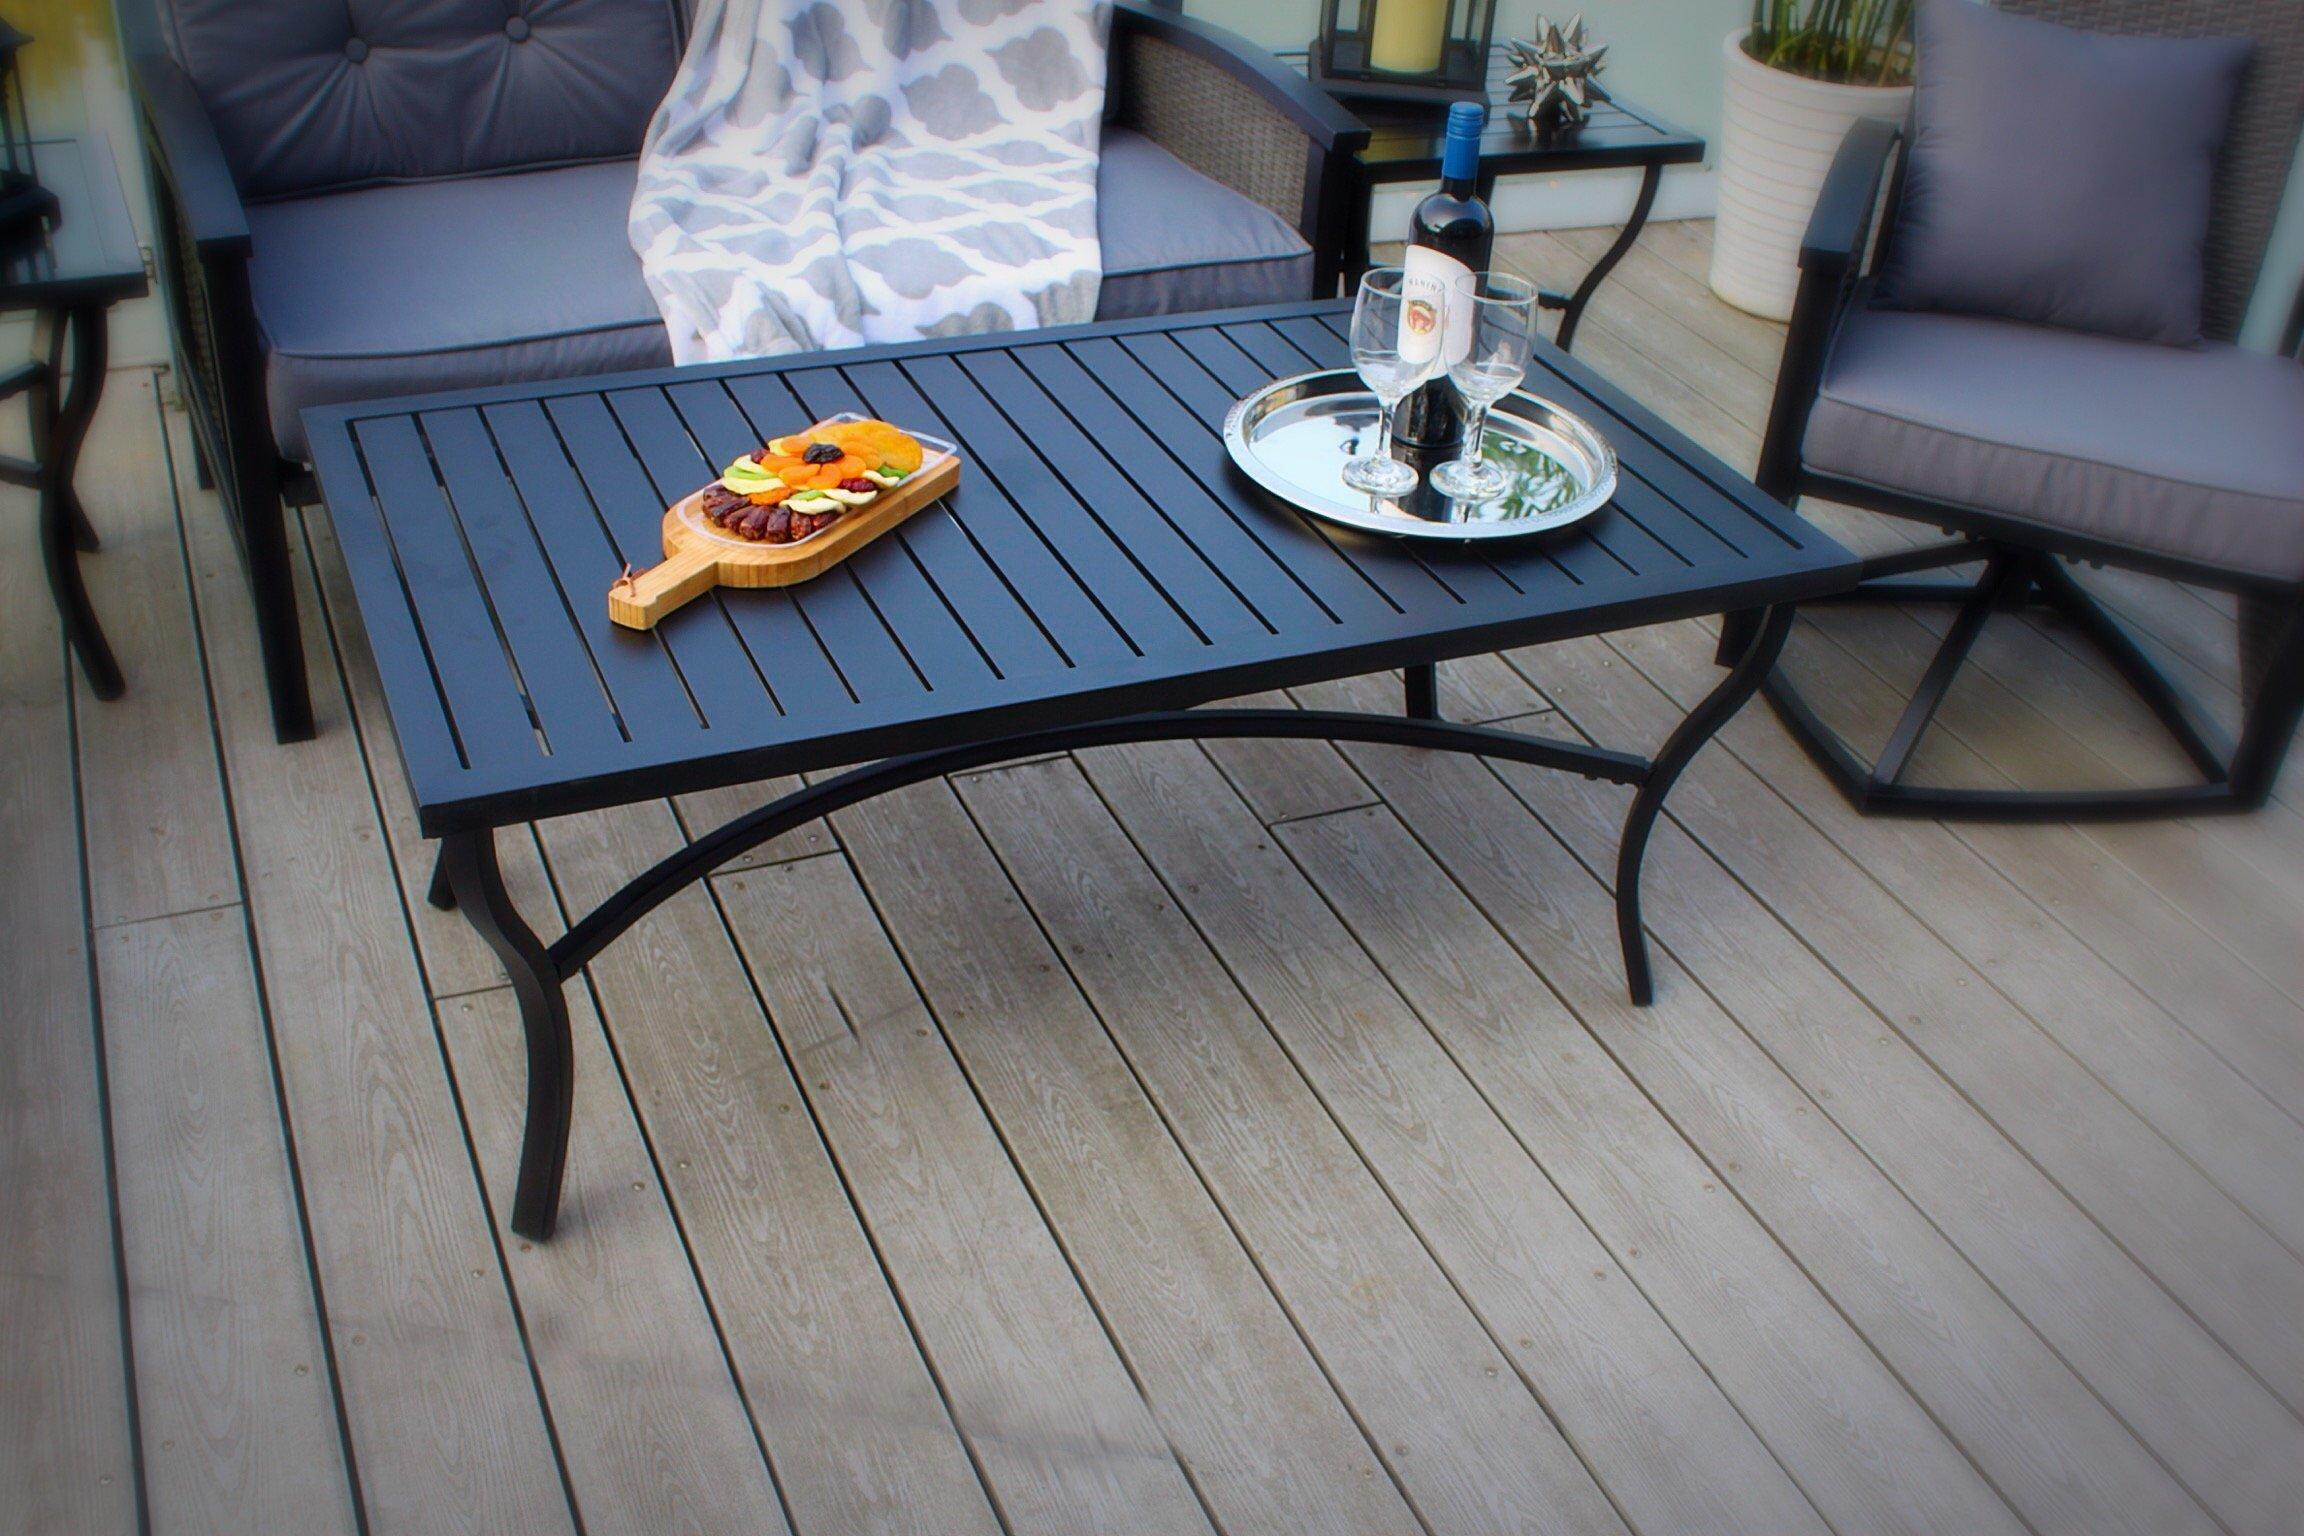 Pebble Lane Living Weather Resistant Powder-Coated Aluminum Slat Top Rectangle Patio Coffee Table - Black